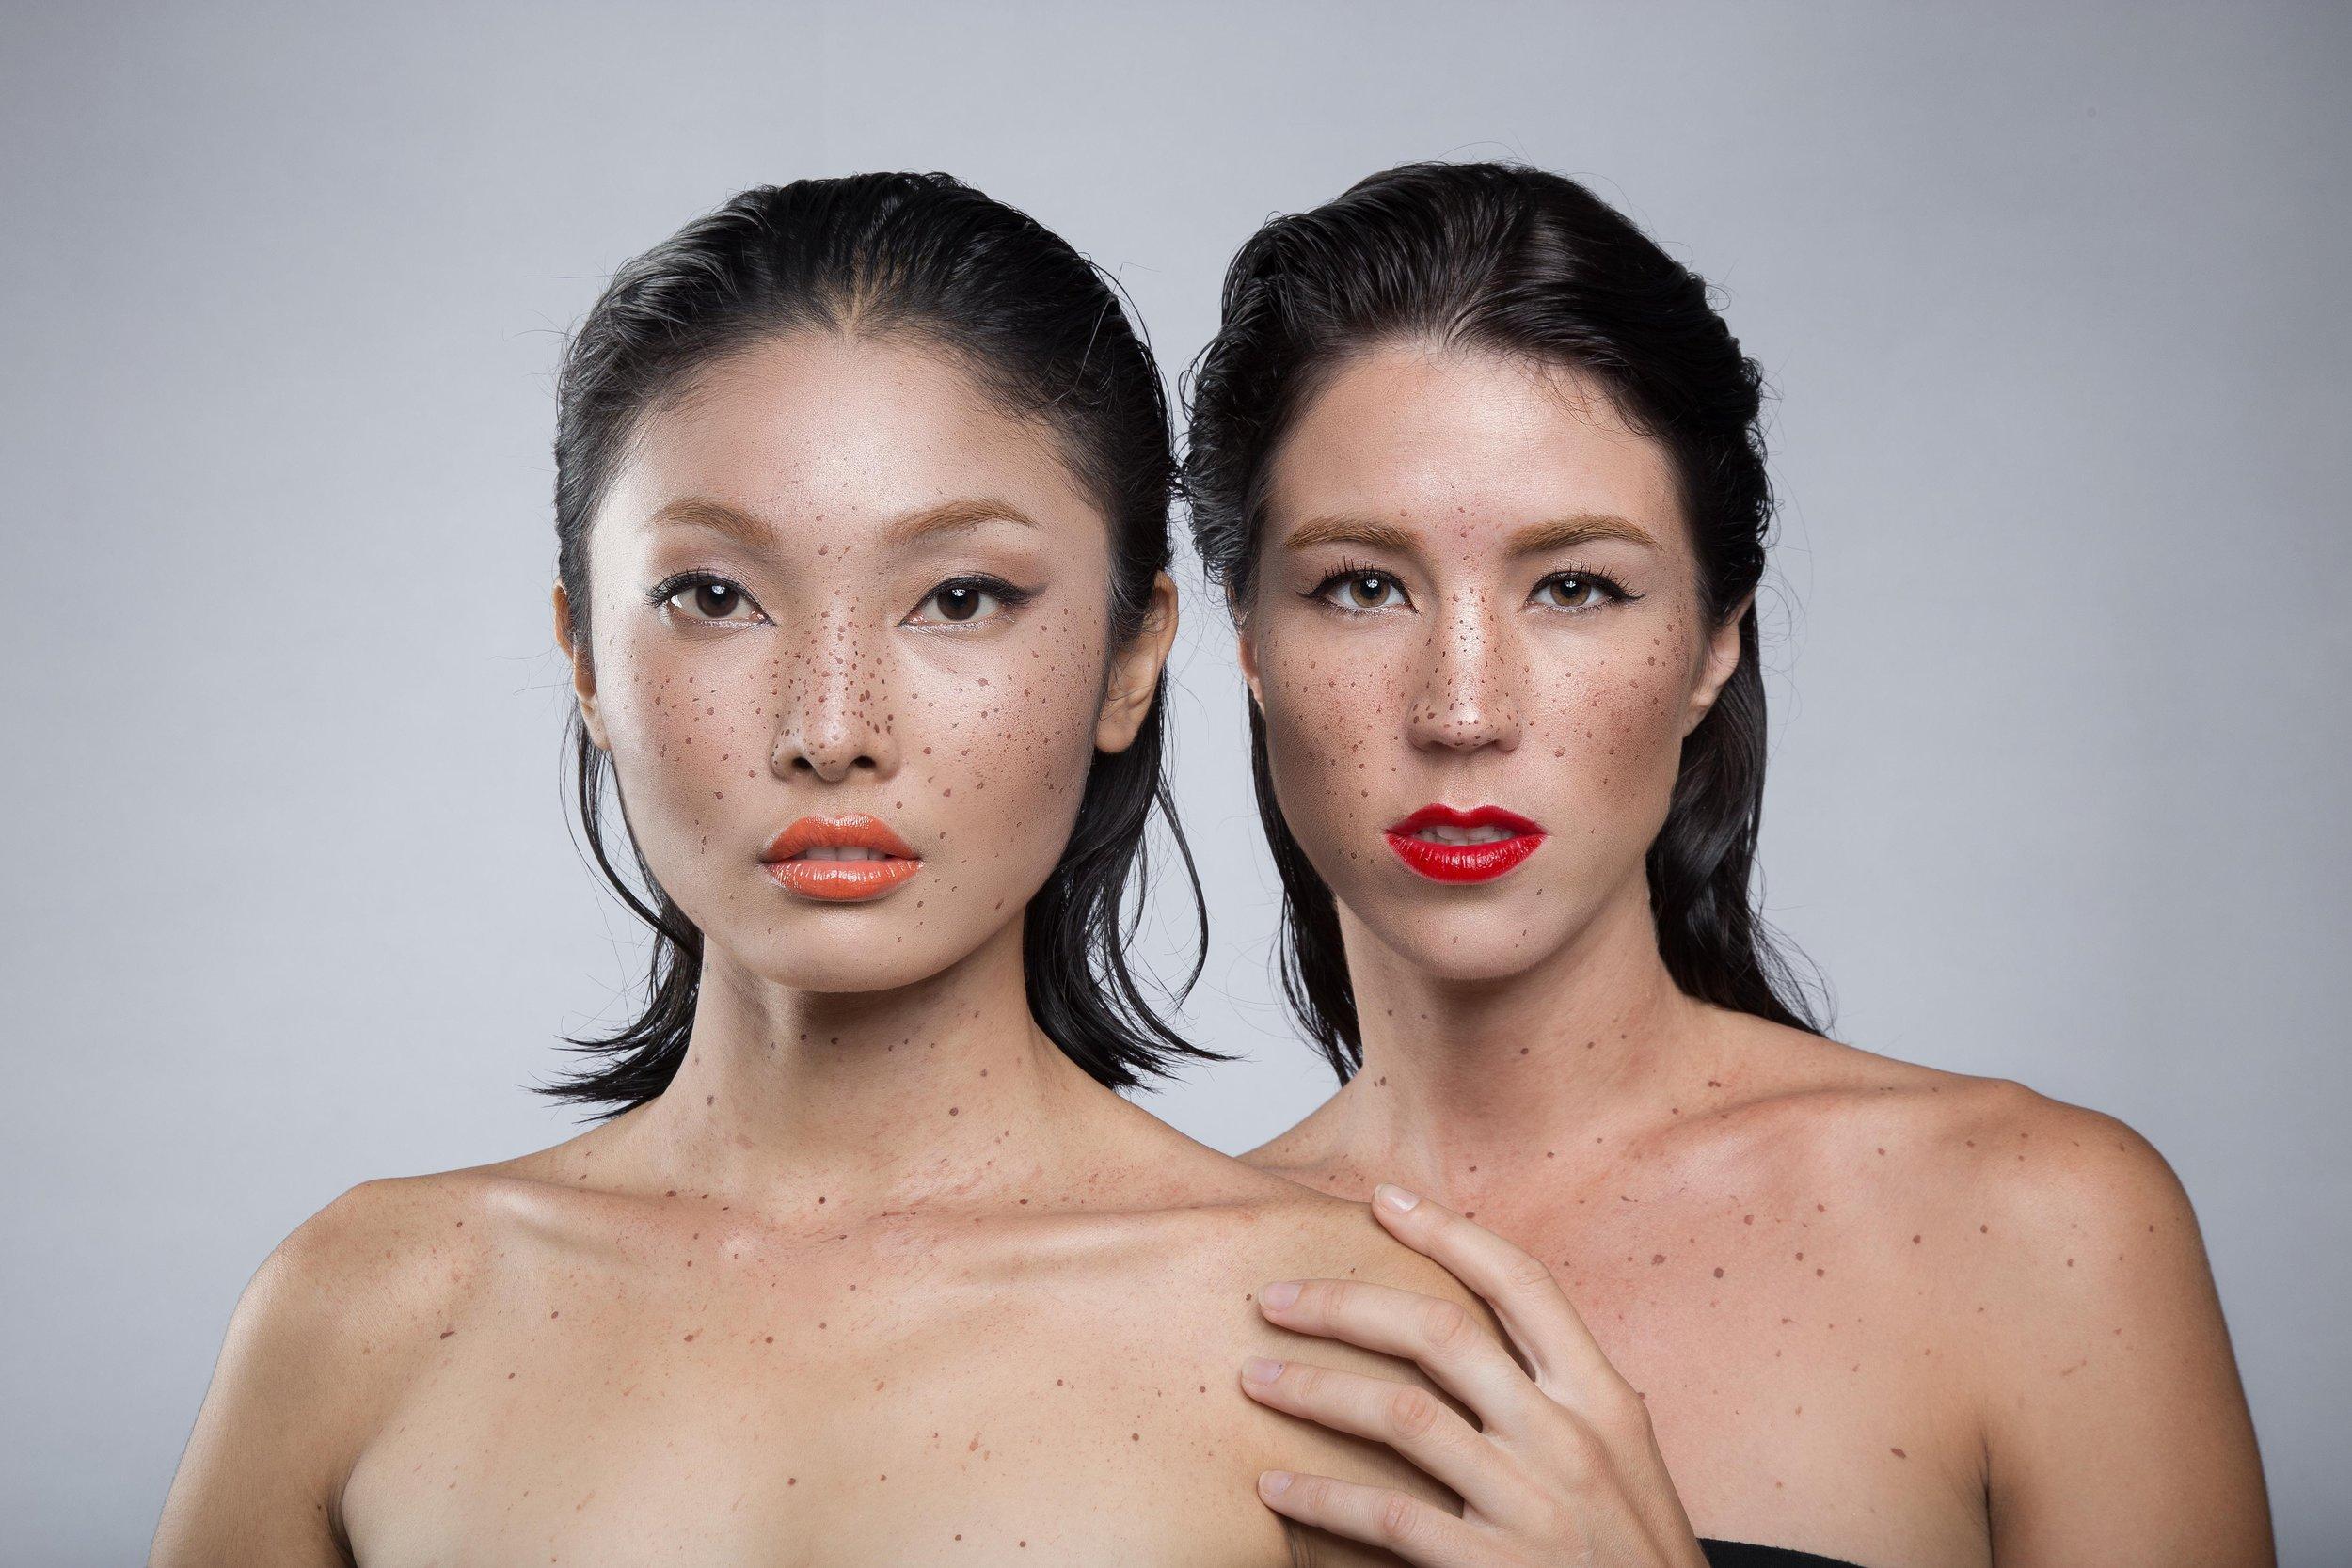 asian-model-attractive-beautiful-1782283.jpg